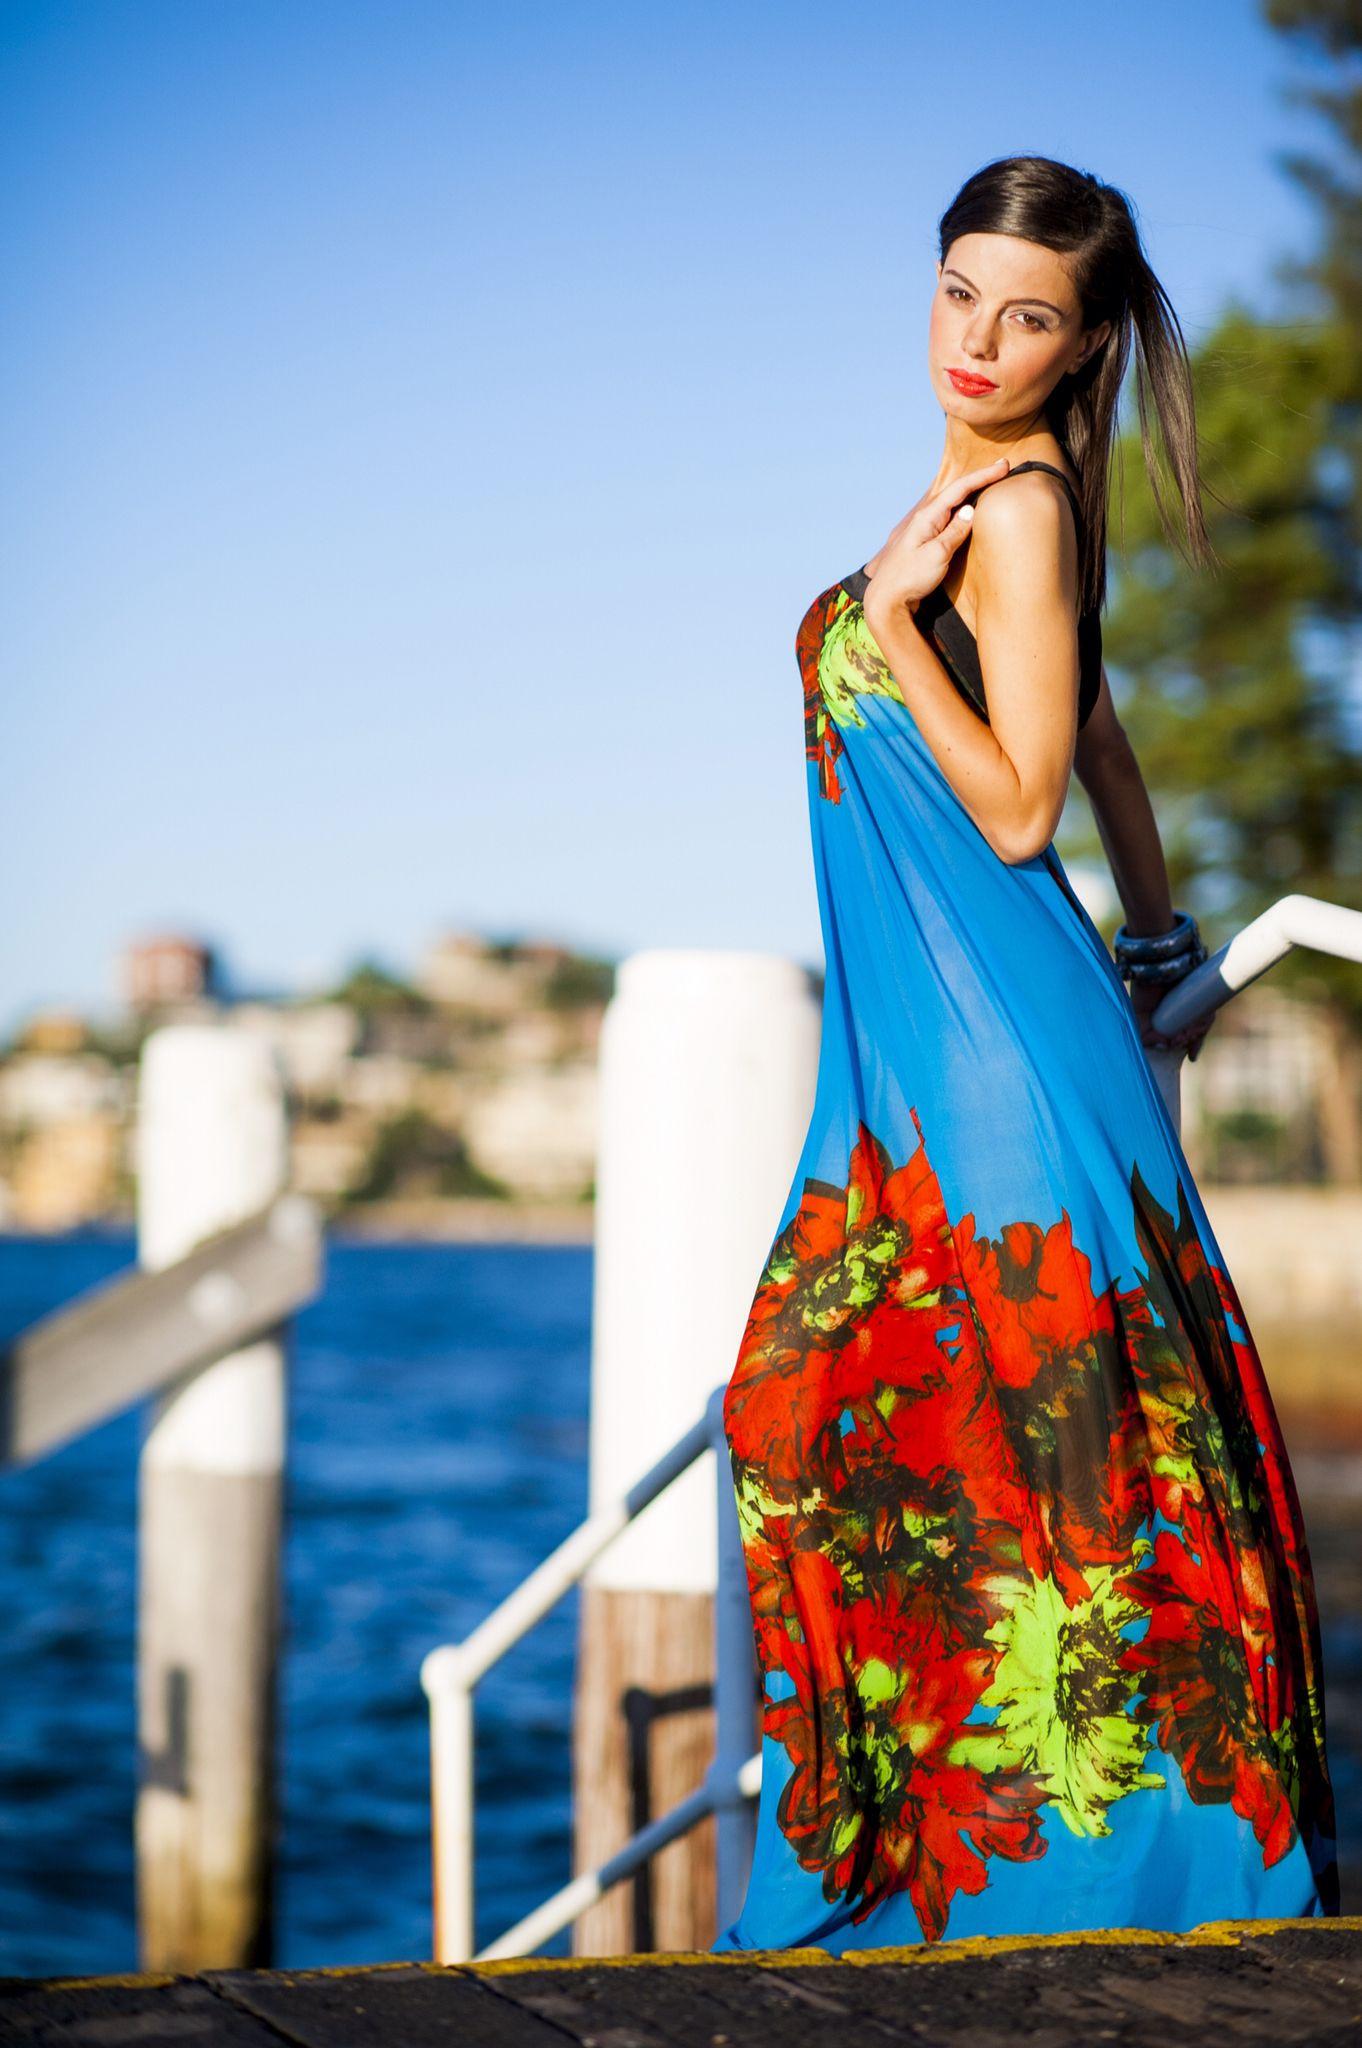 Fashion shoot editorial photography art creative LAGUNA SYDNEY ...